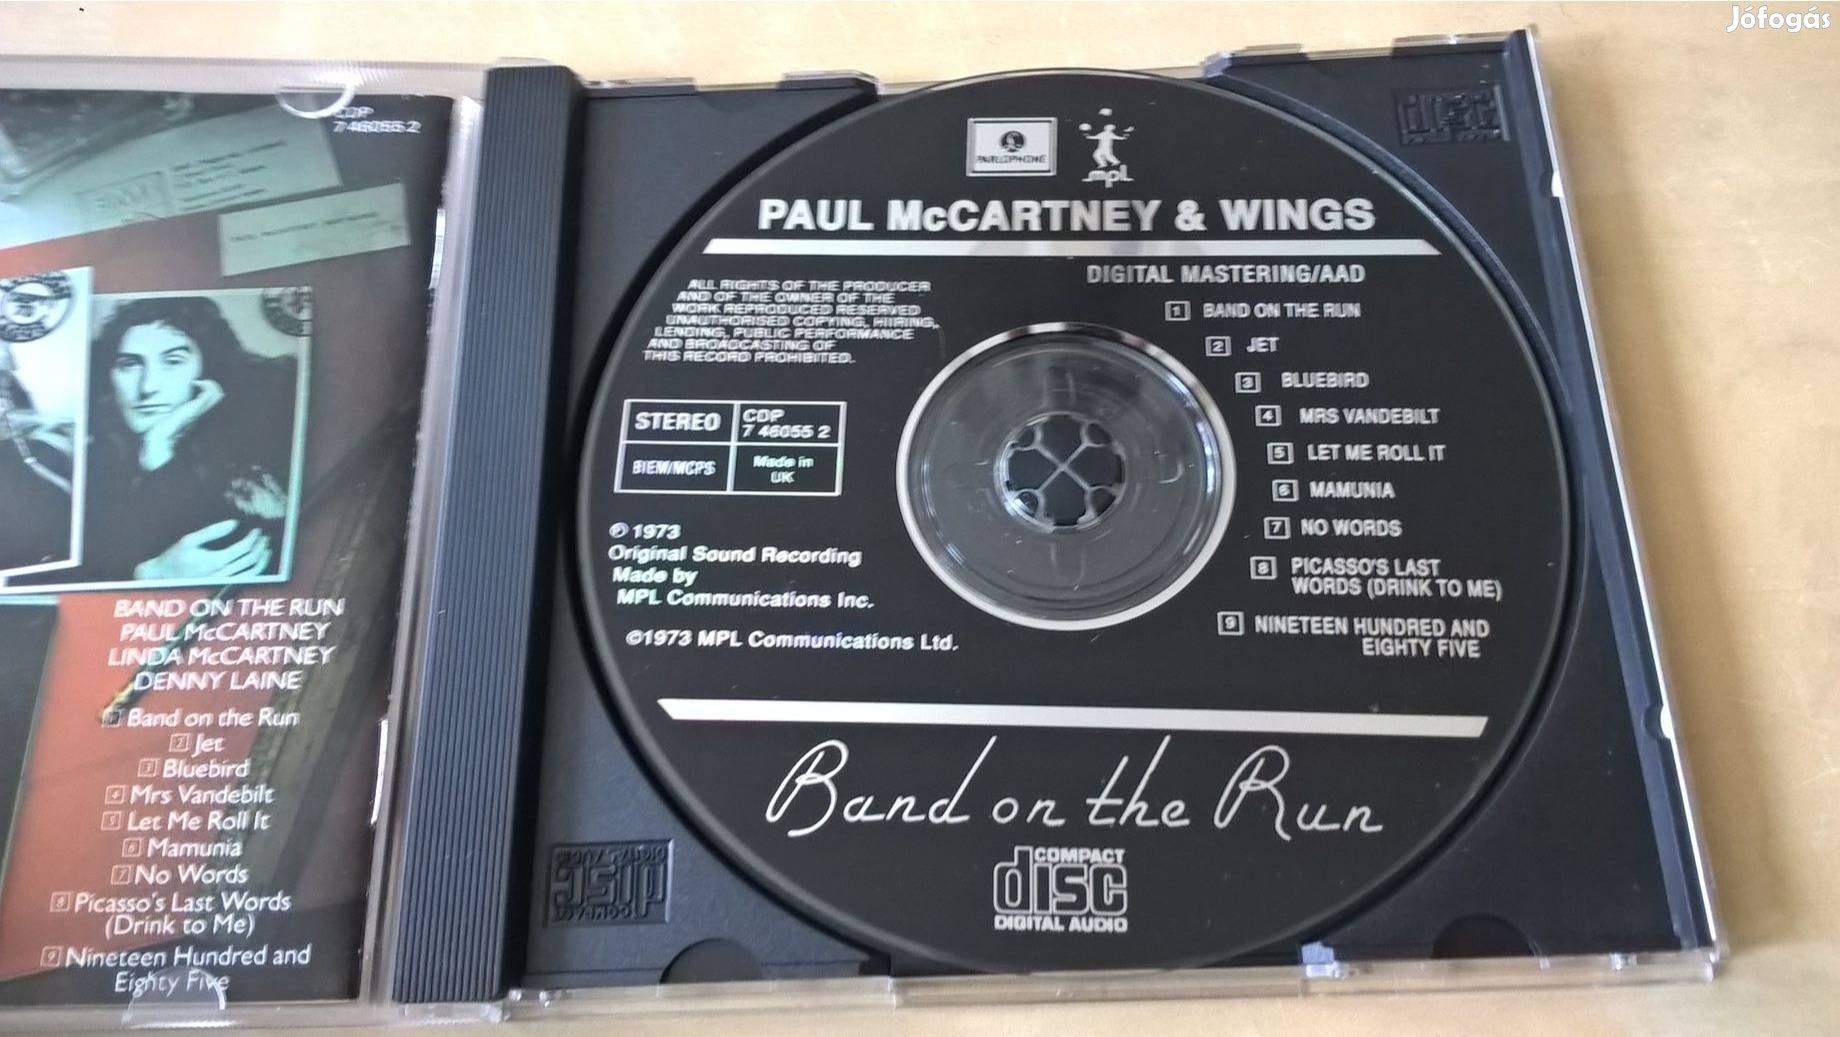 Paul Mccartney & Wings - Band On The Run CD